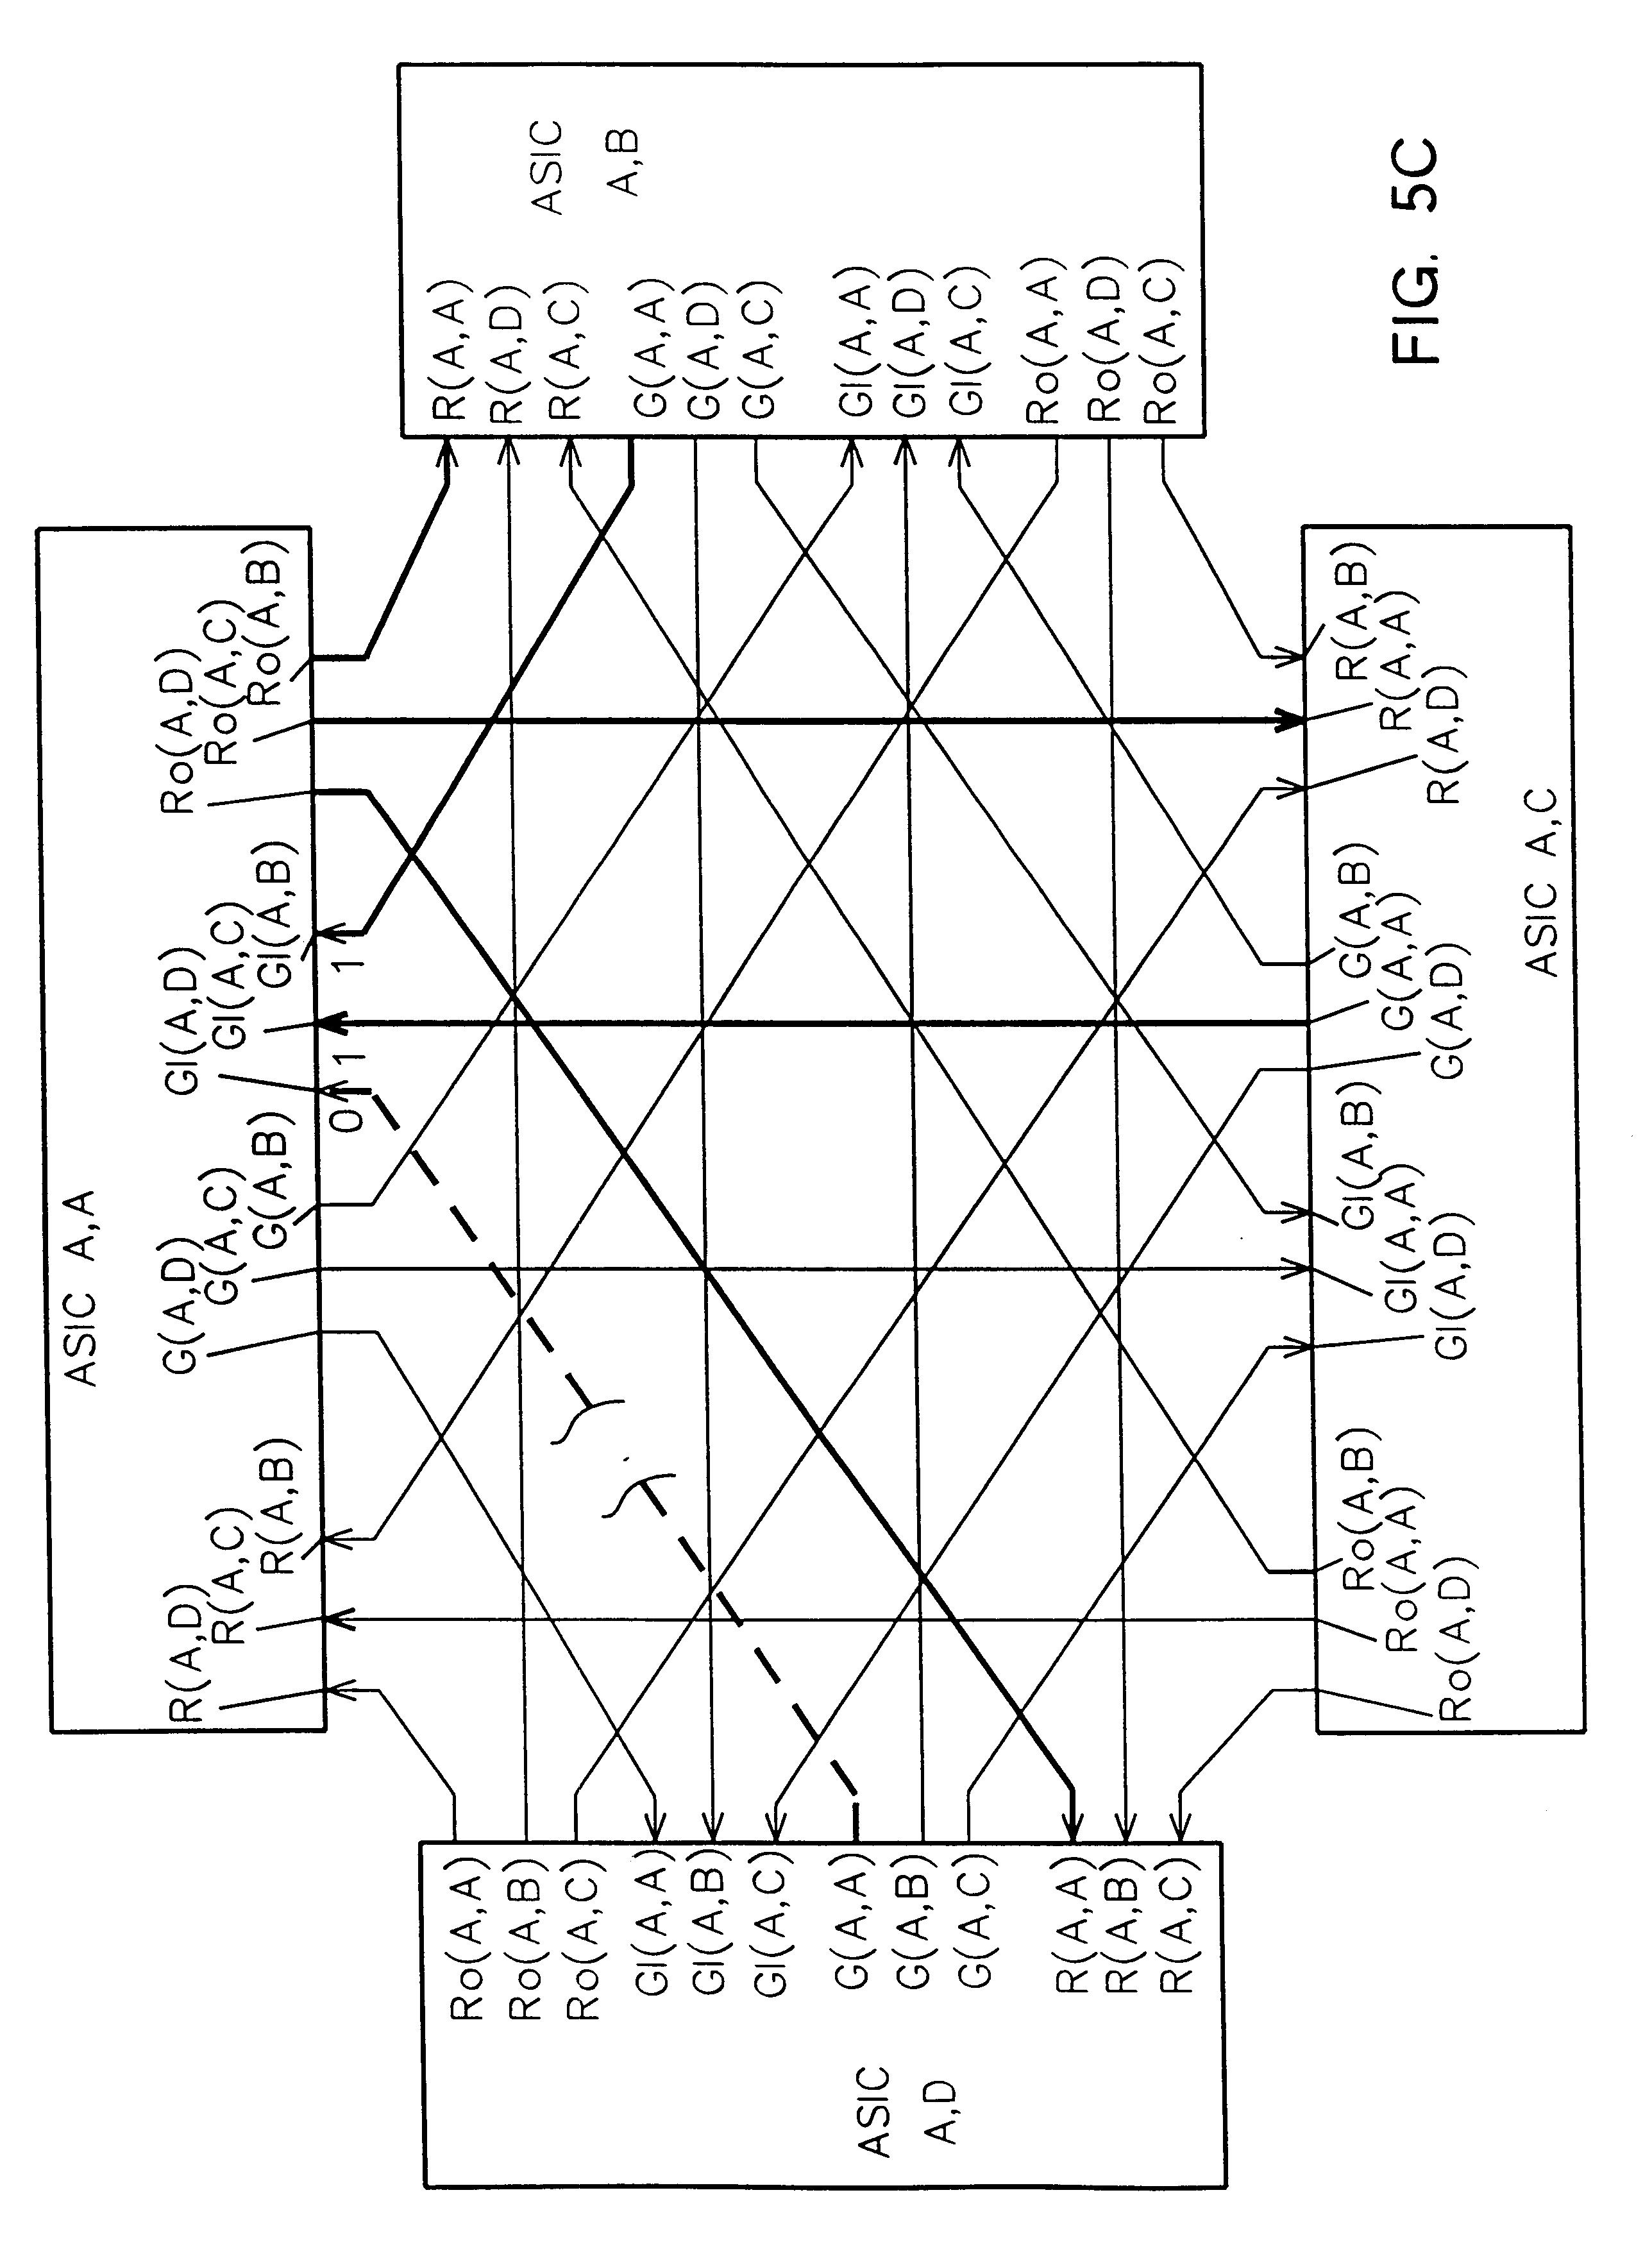 yg_3517_01a01电路图